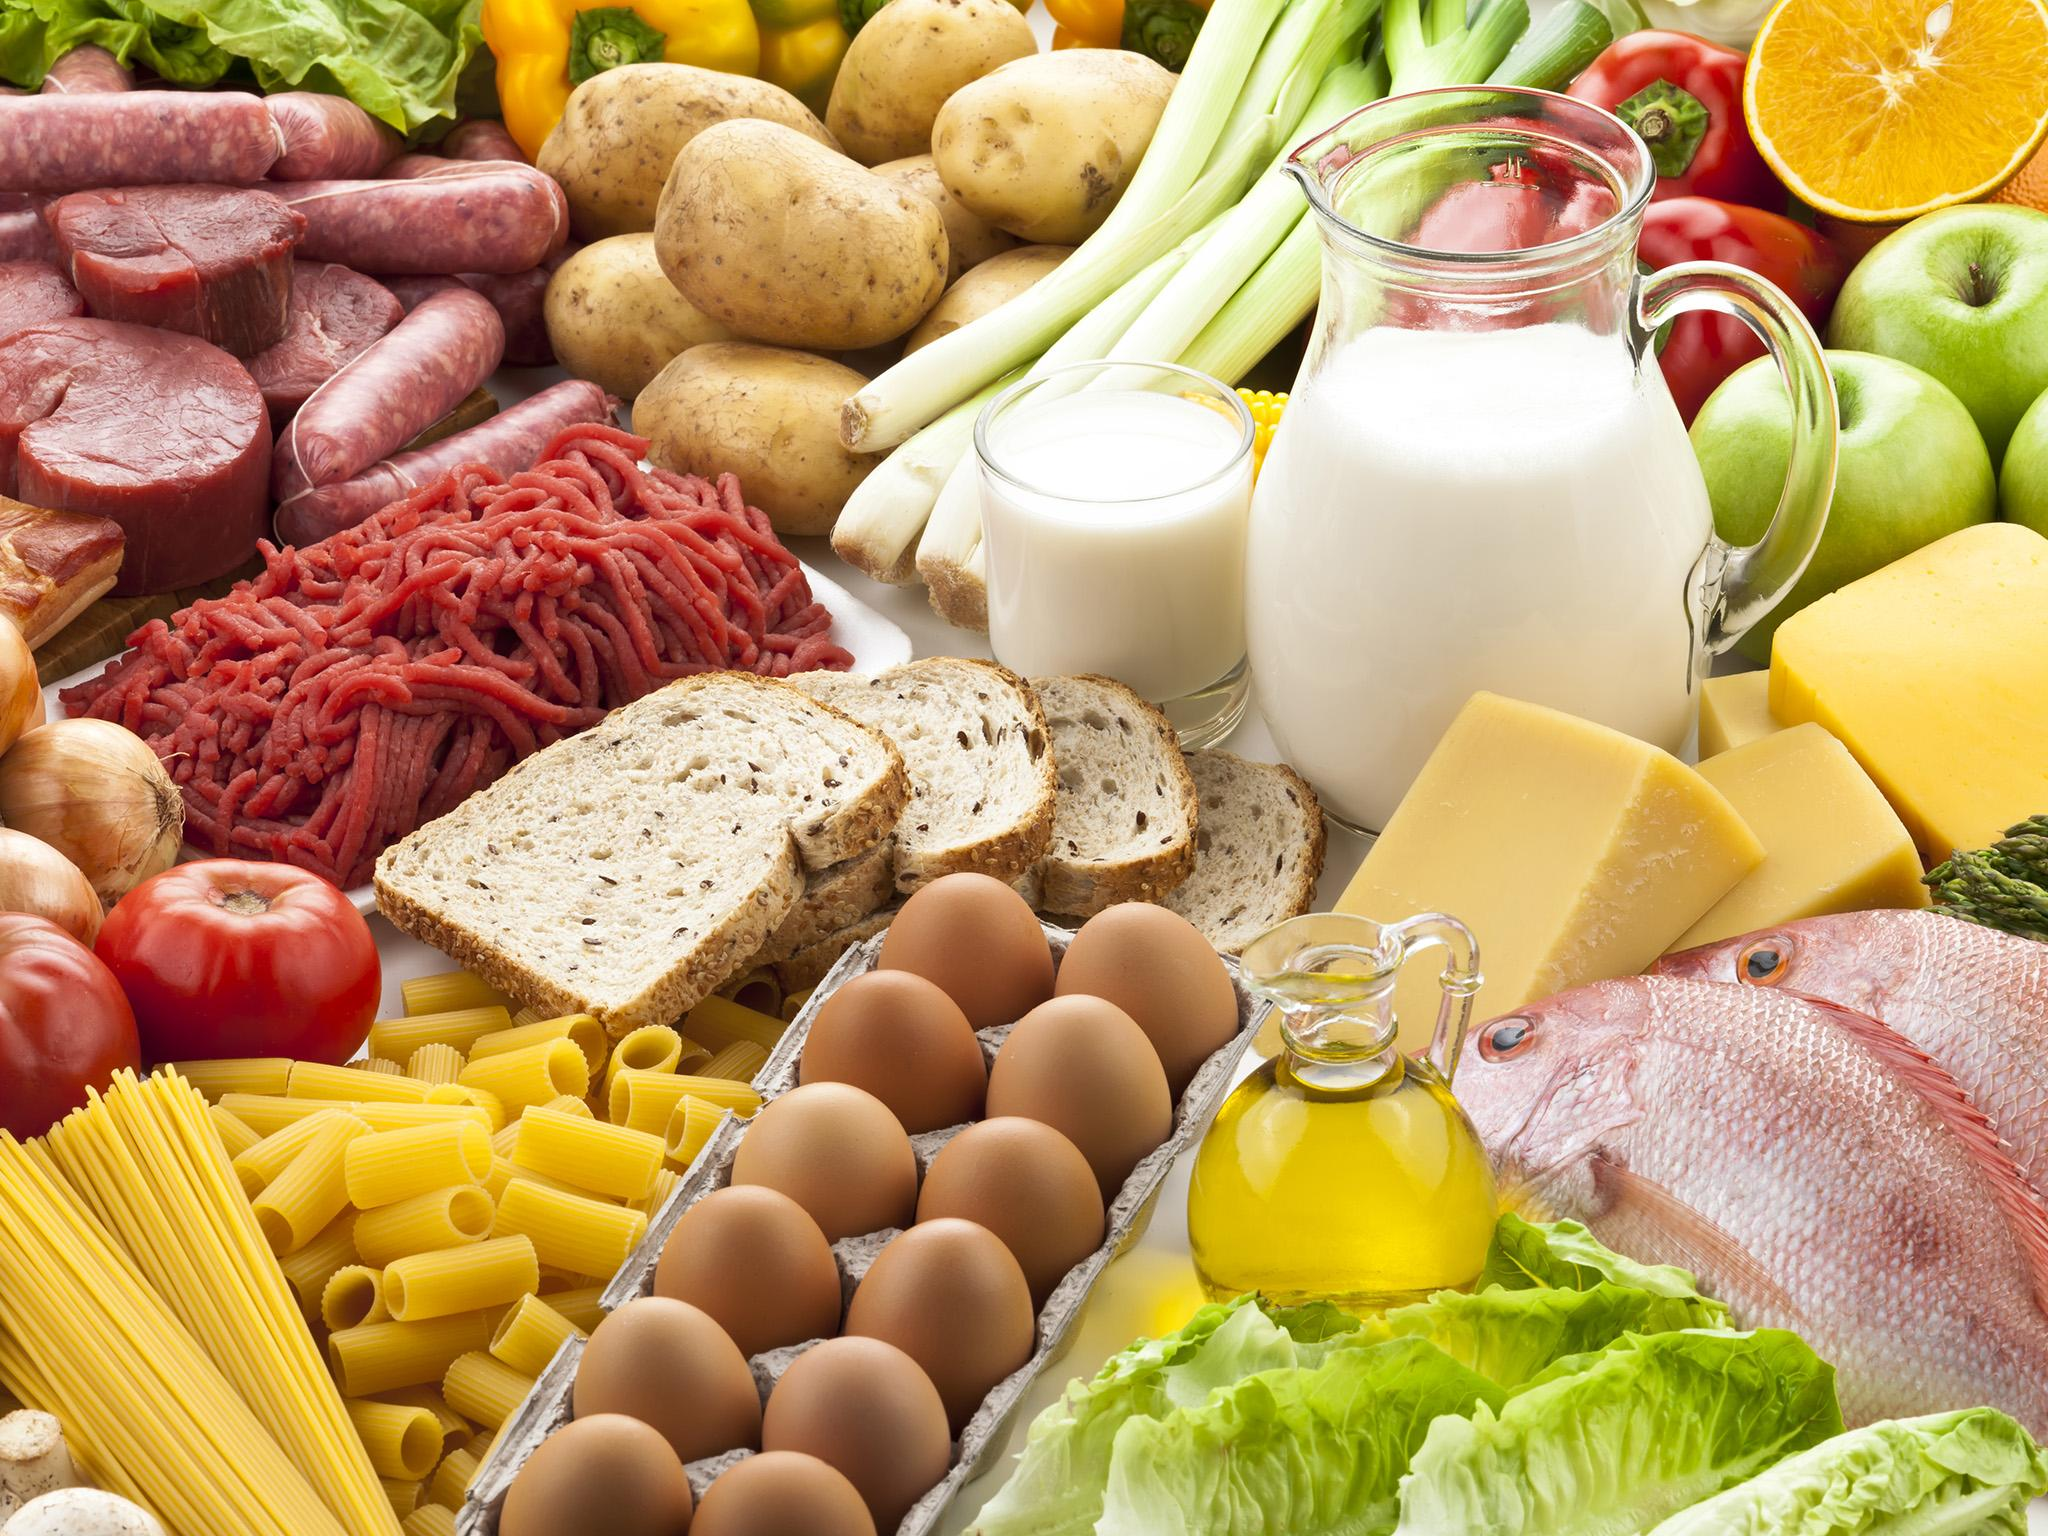 Food Groups image